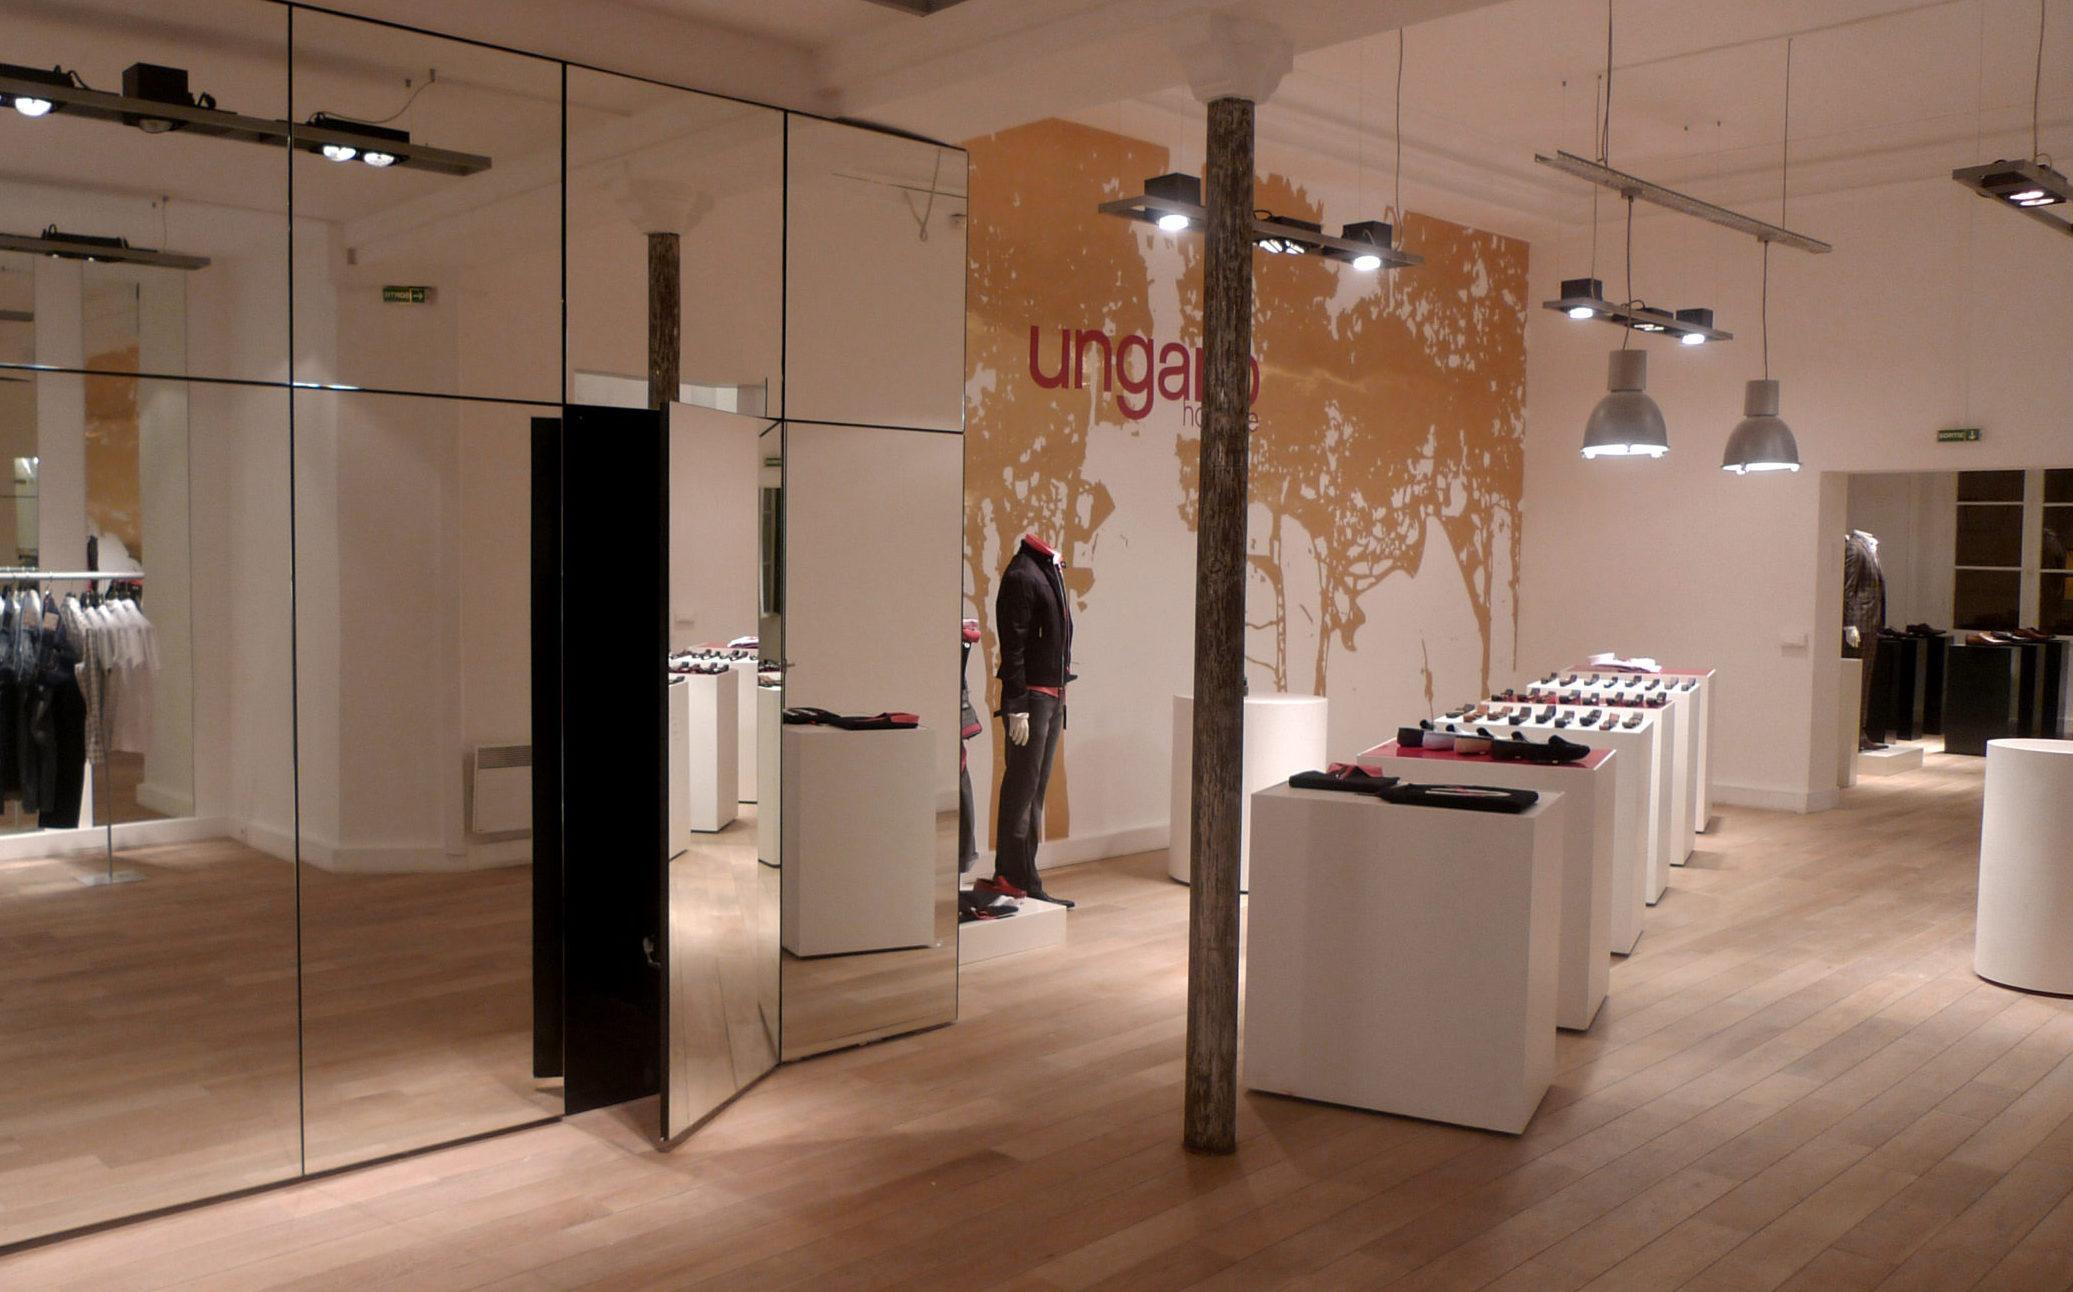 spatial practice architecture office Los Angeles Hong Kong emanuel ungaro showroom paris france hidden toilet